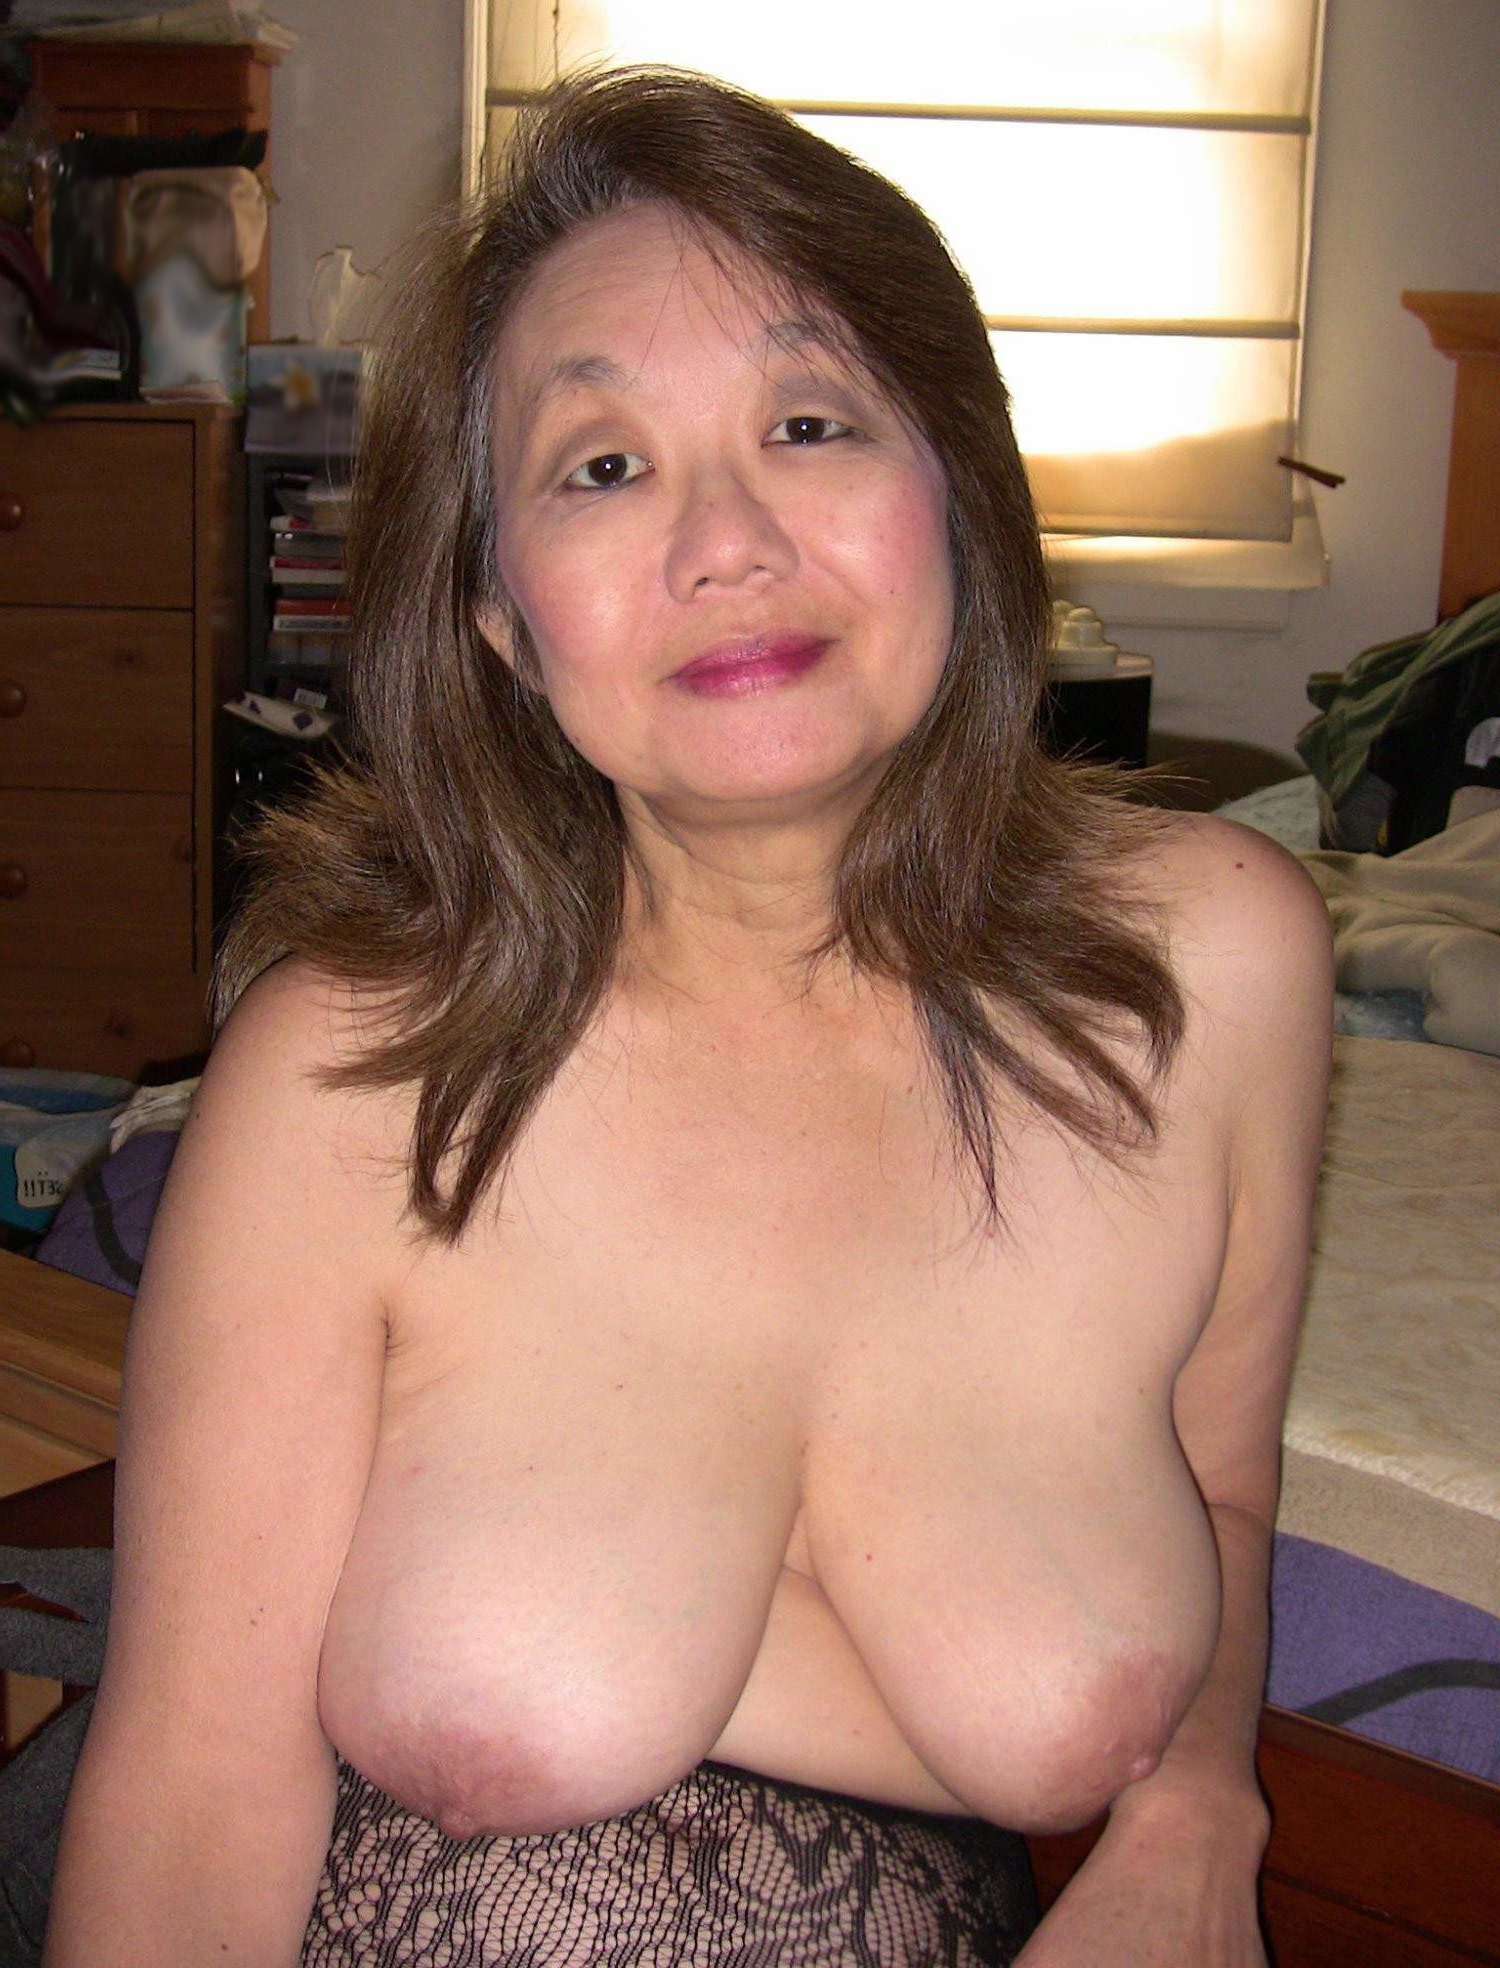 Tag archive for arisawa tatsuki bleach pixxx page